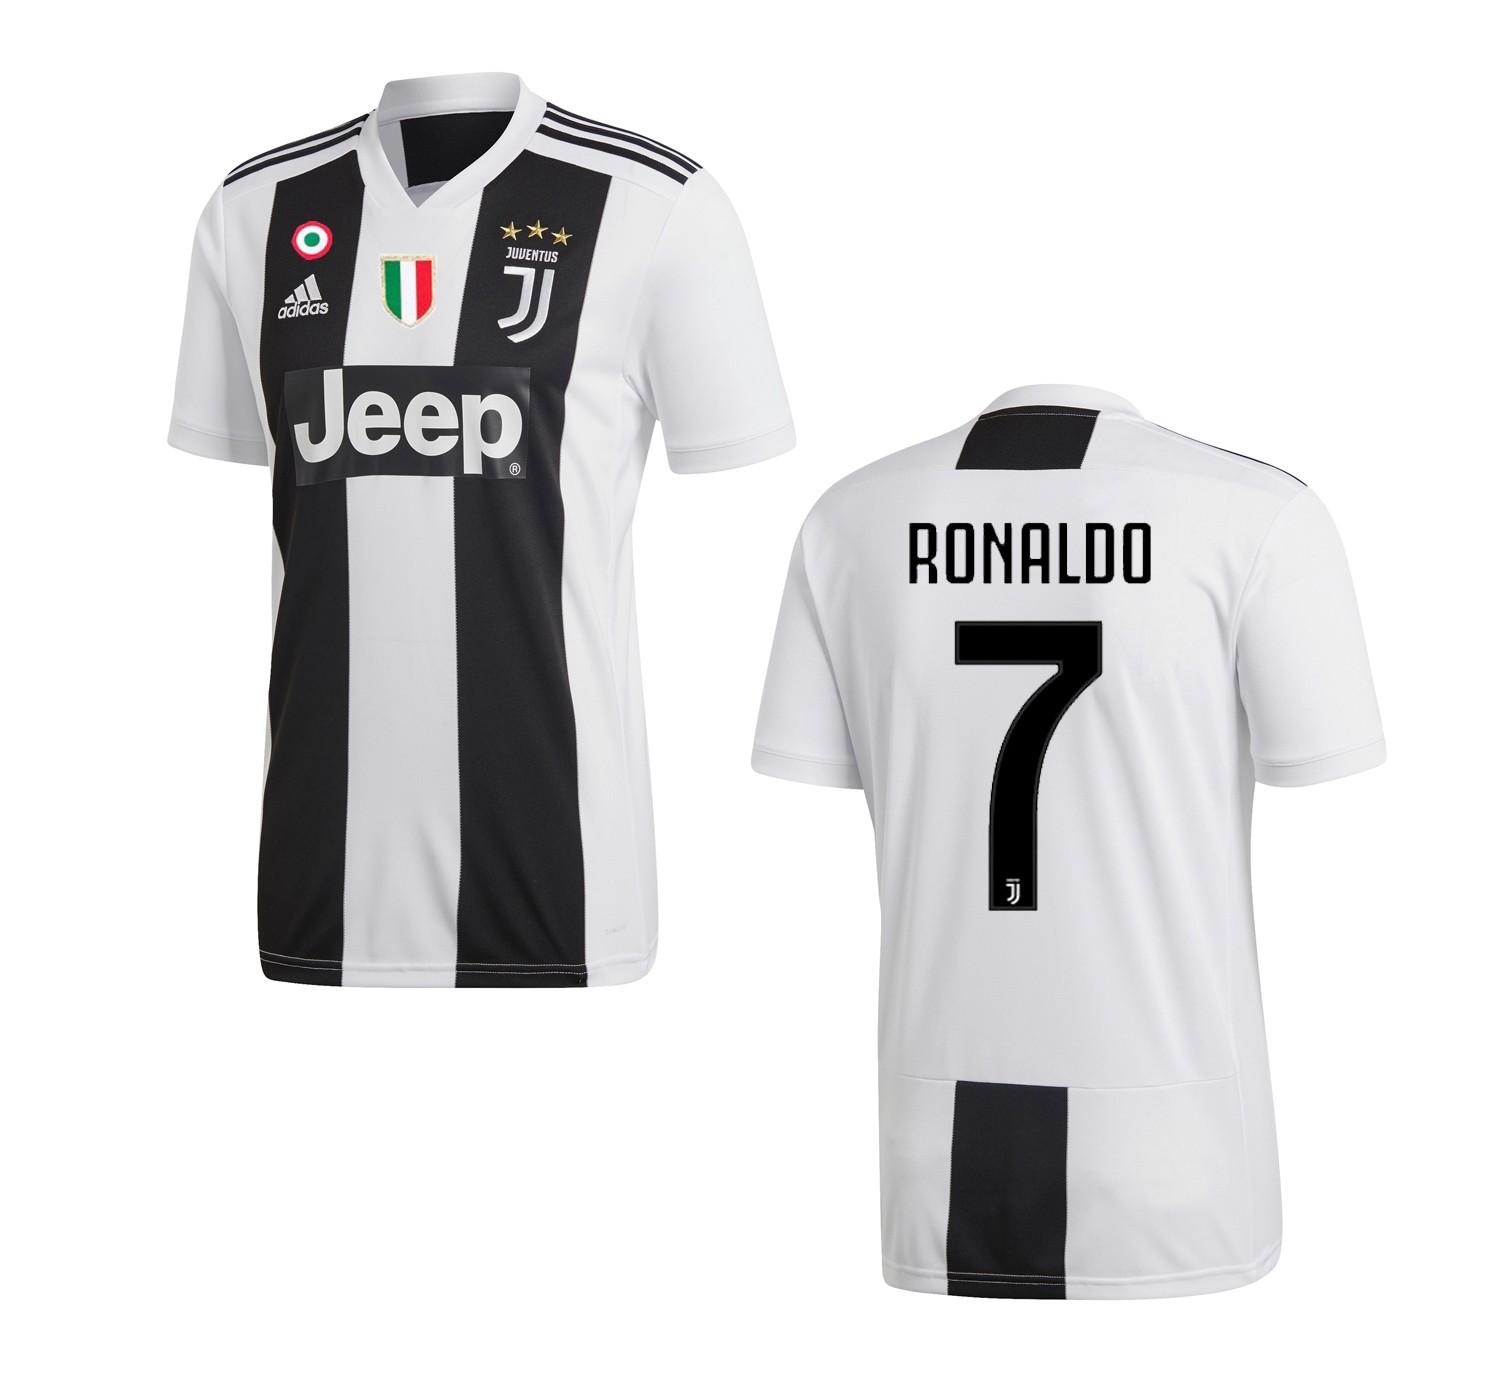 5038b4458b782e Ronaldo 7 Jersey Juventus home 2018/2019 Adidas